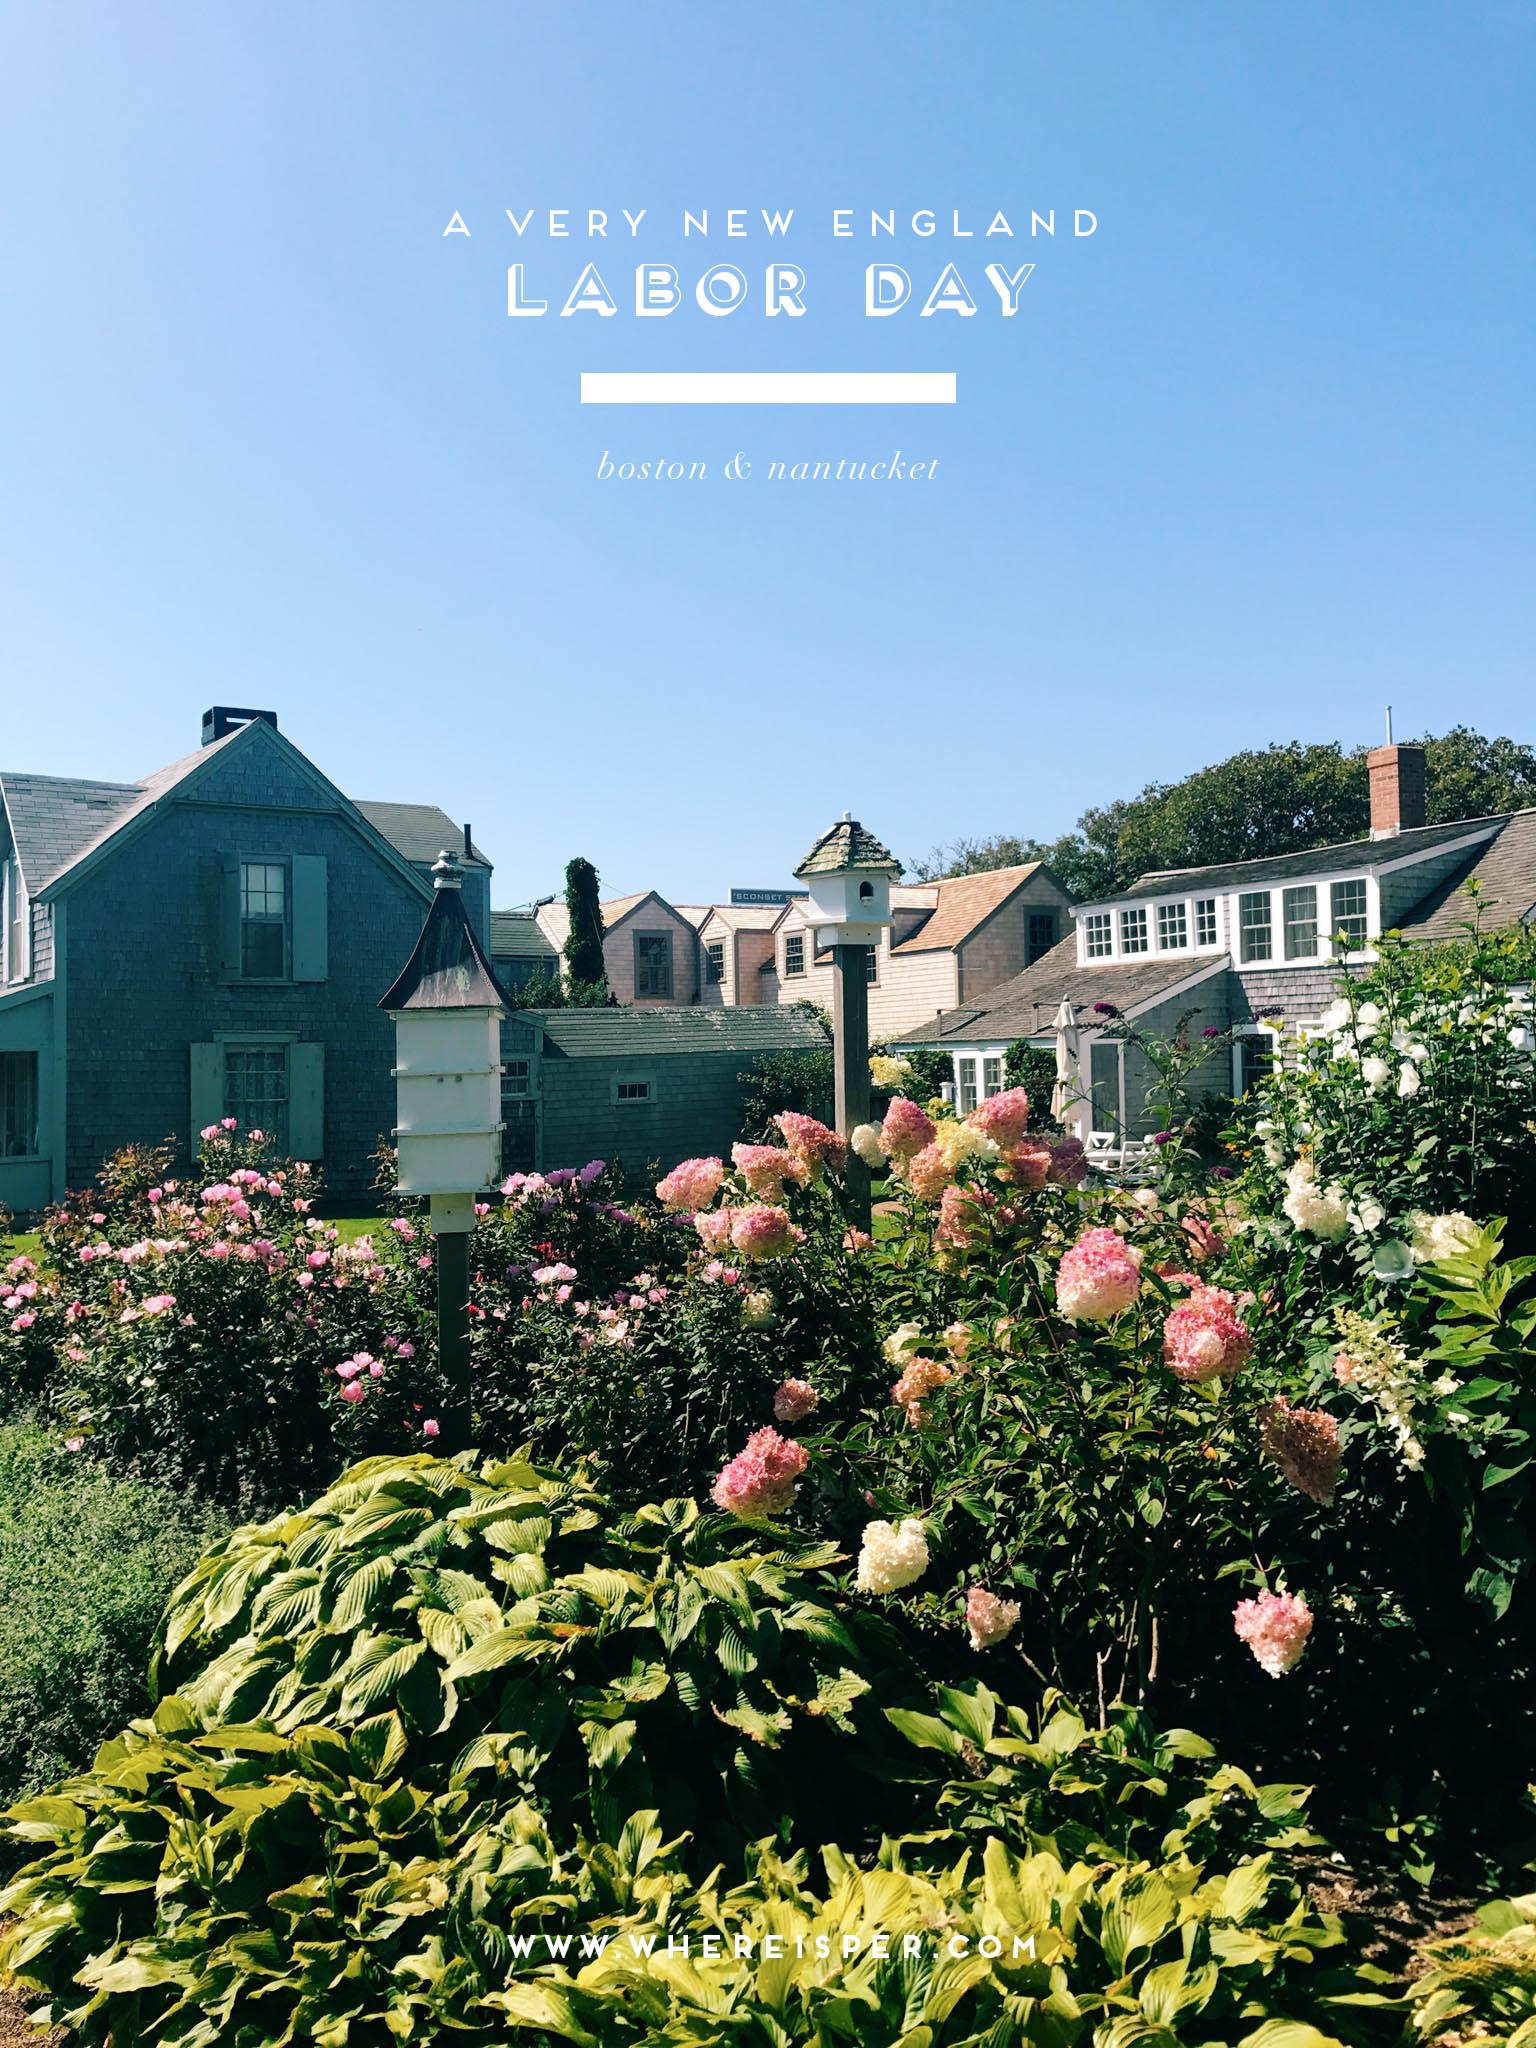 Nantucket & Boston / Where Is Per